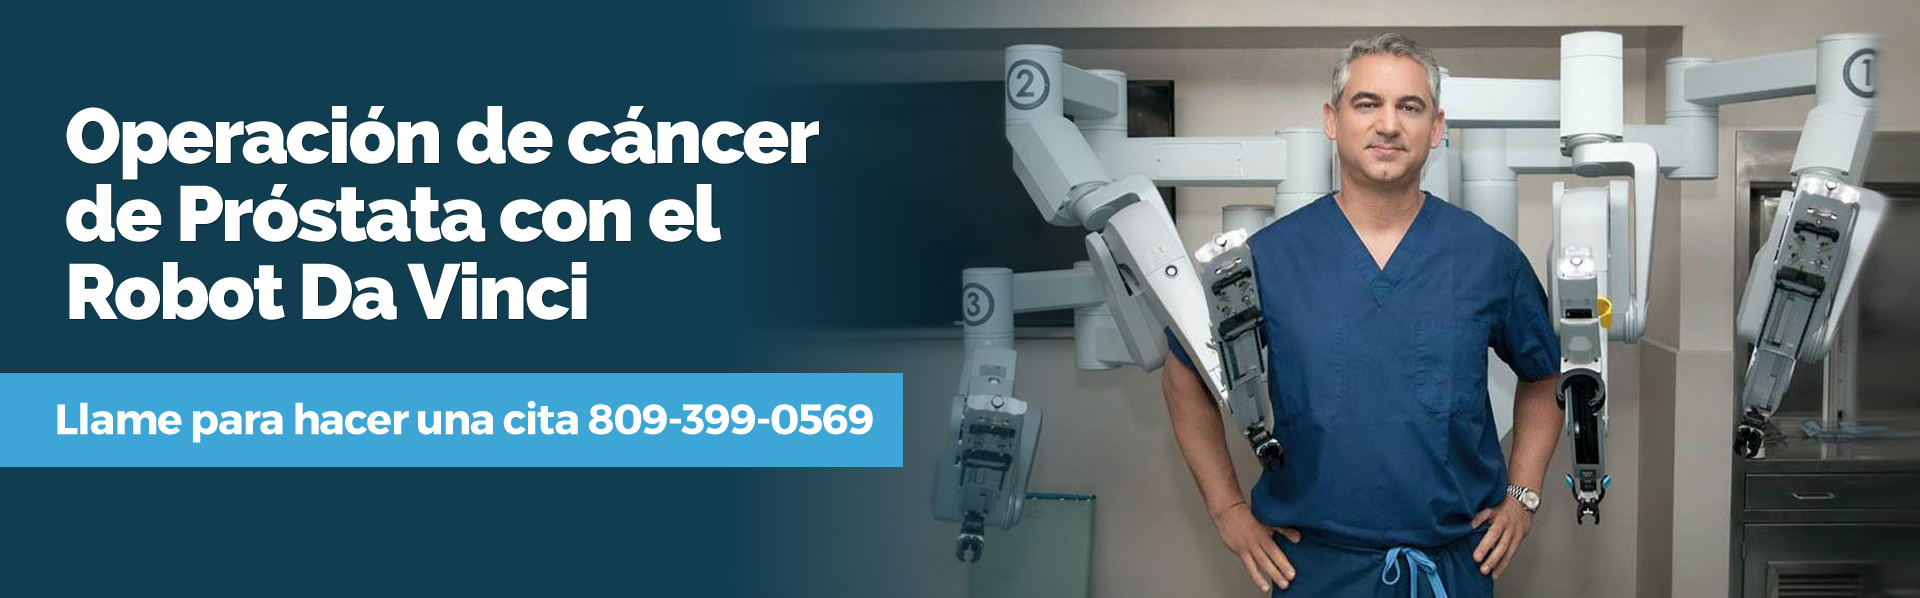 operacion cancer prostata da vinci